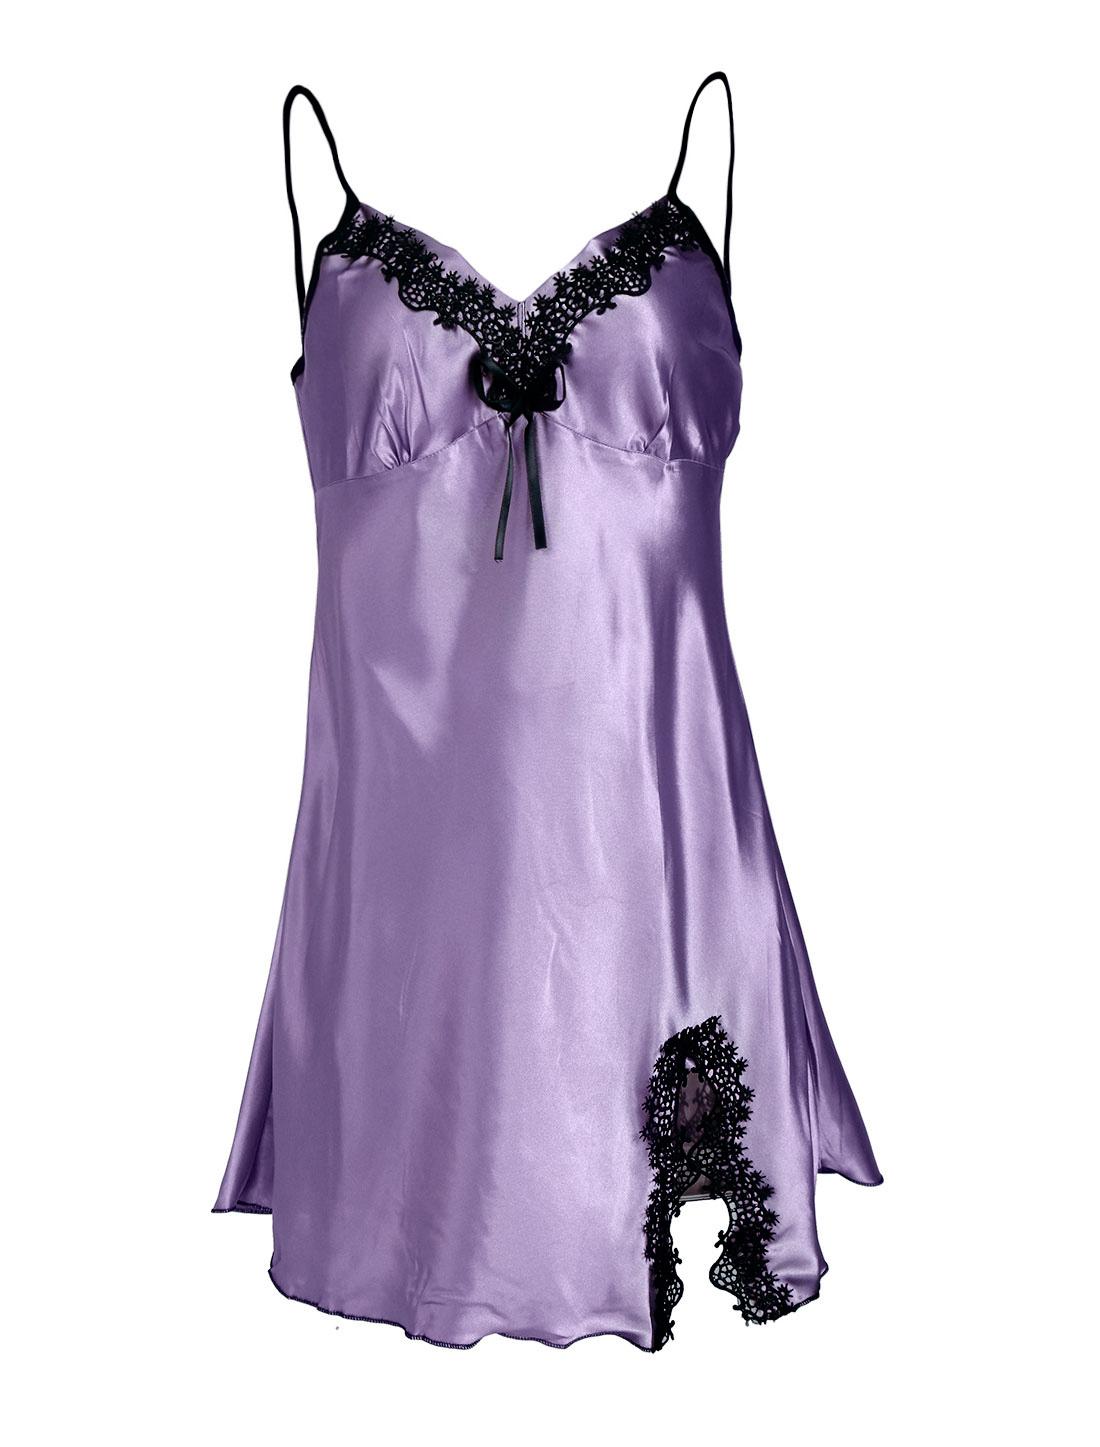 Women Satin Lace Trim Sleepwear Nightgown Pajama Slip Dress Lavender-Lace L